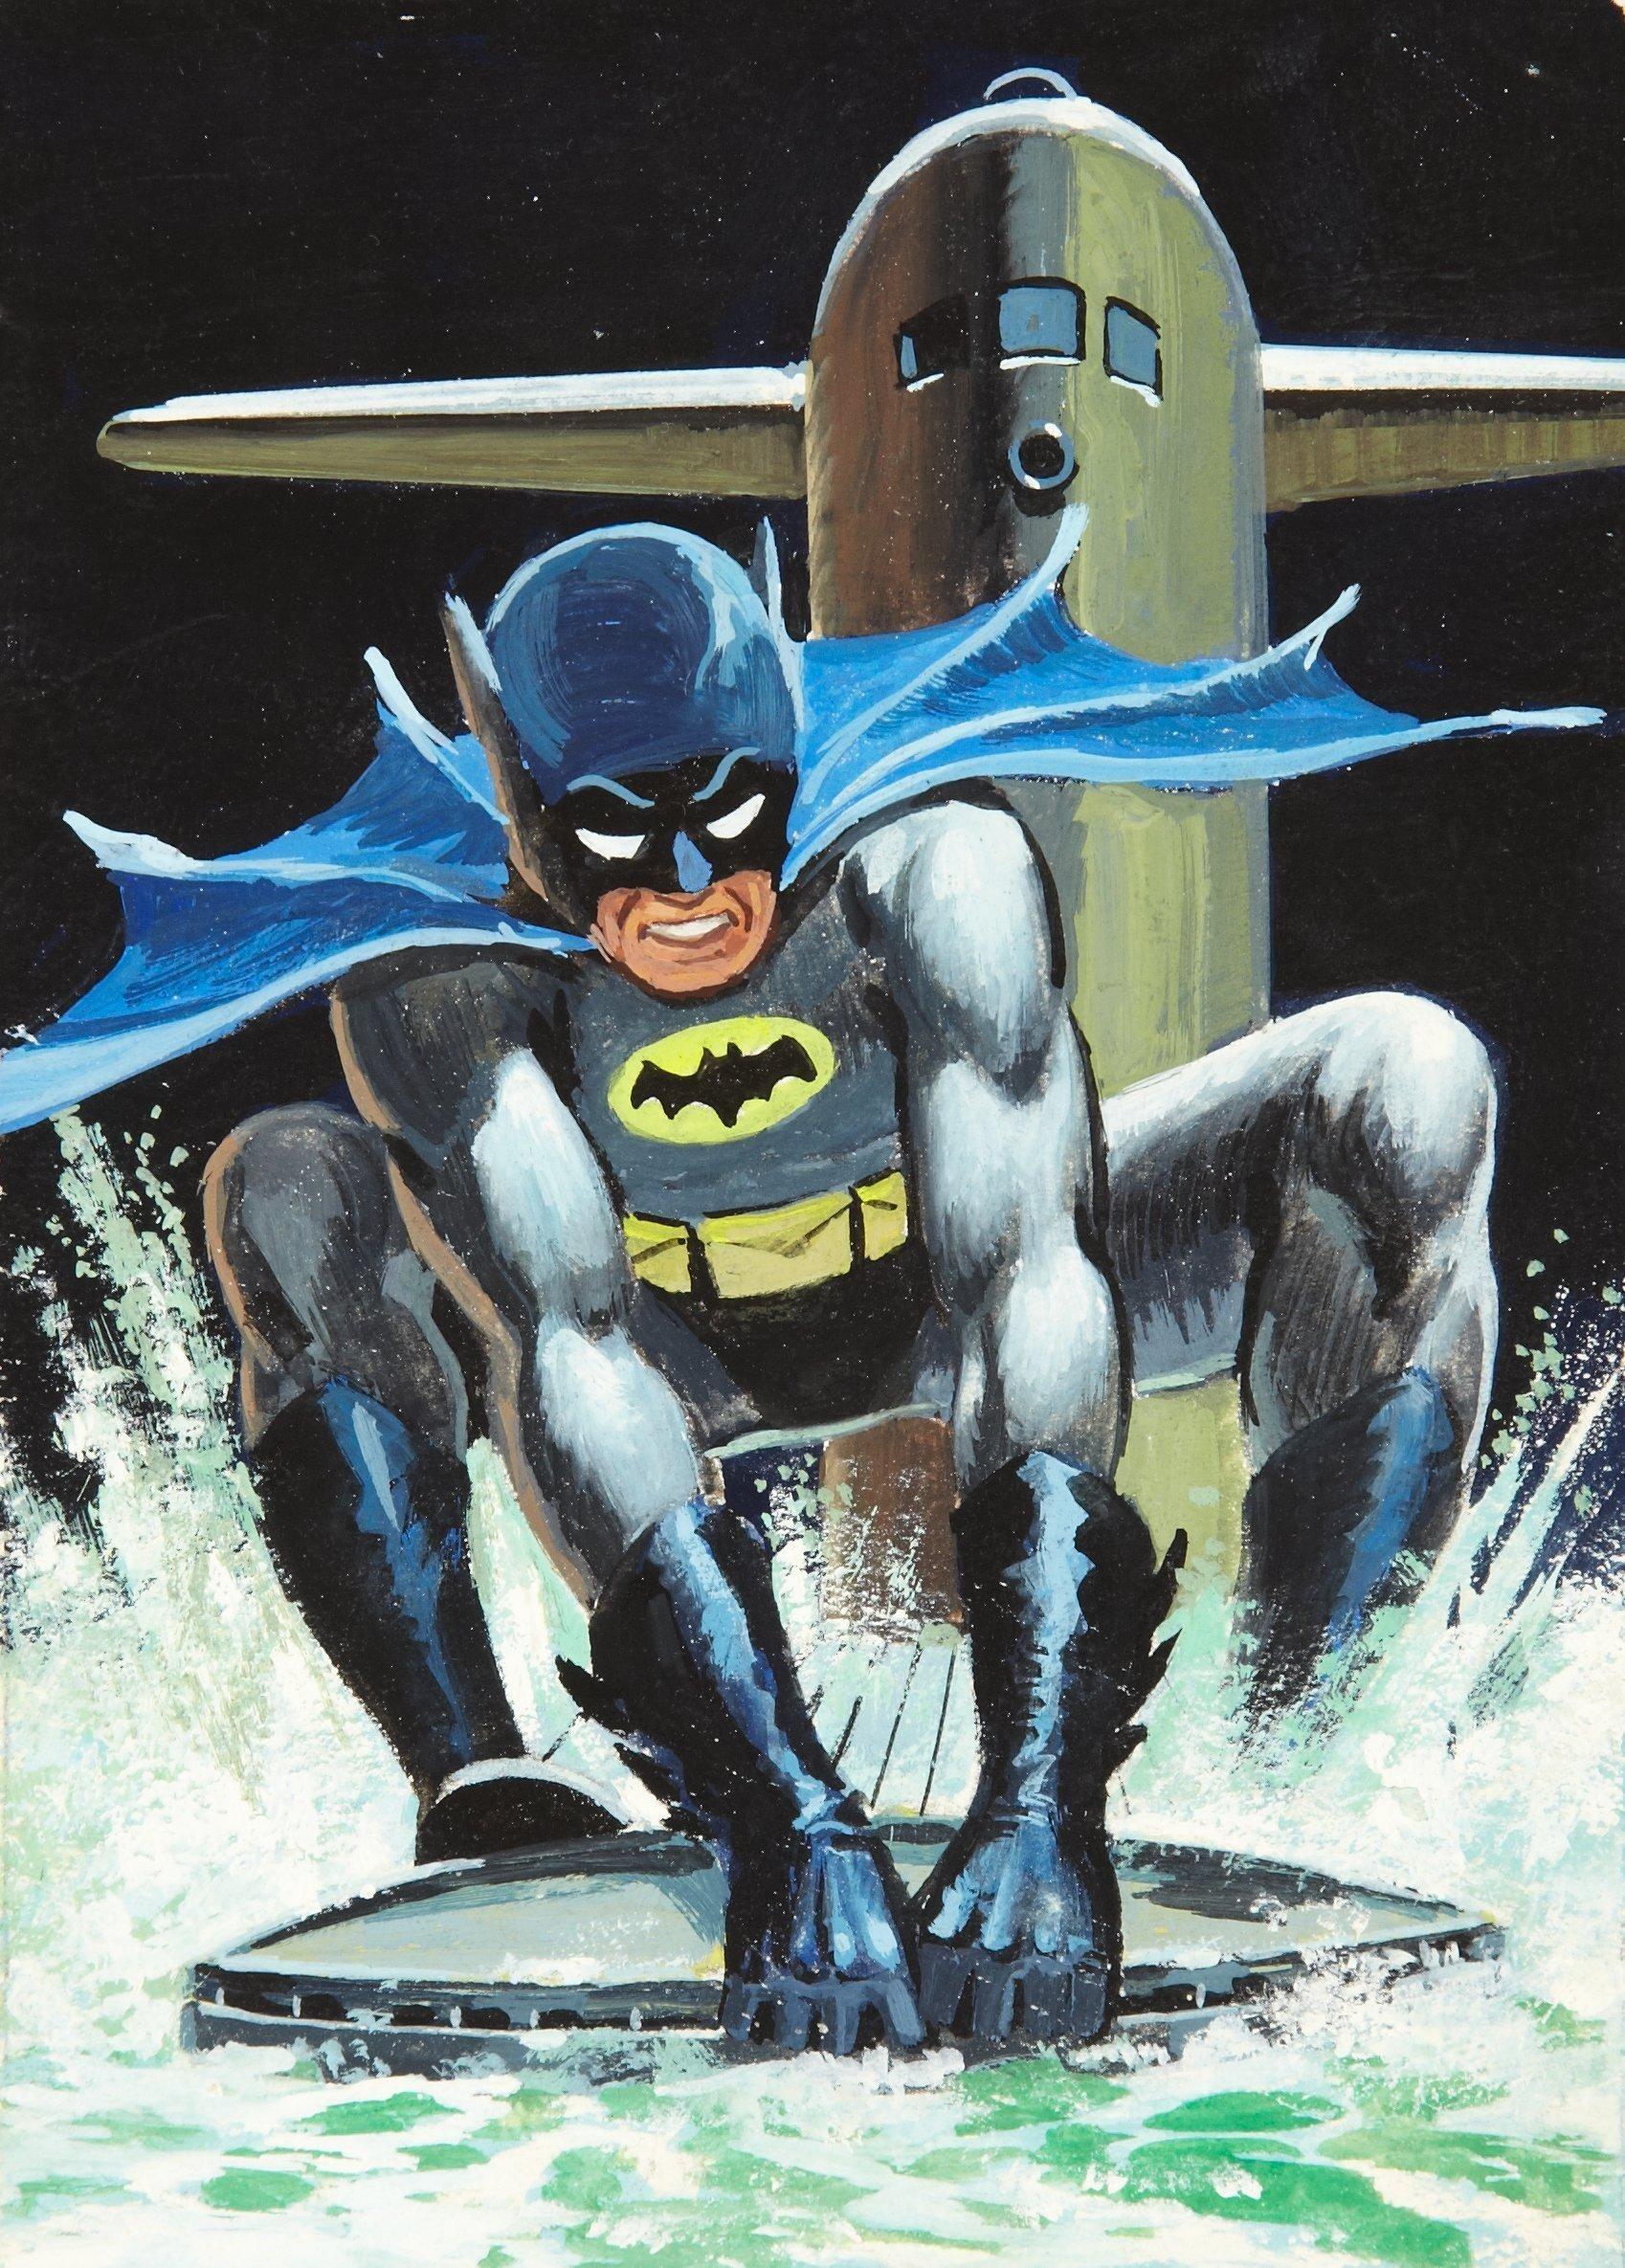 Norm Saunders & Bob Powell - Batman Trading Card Series 2 #39A (Topps 1966) Gouache